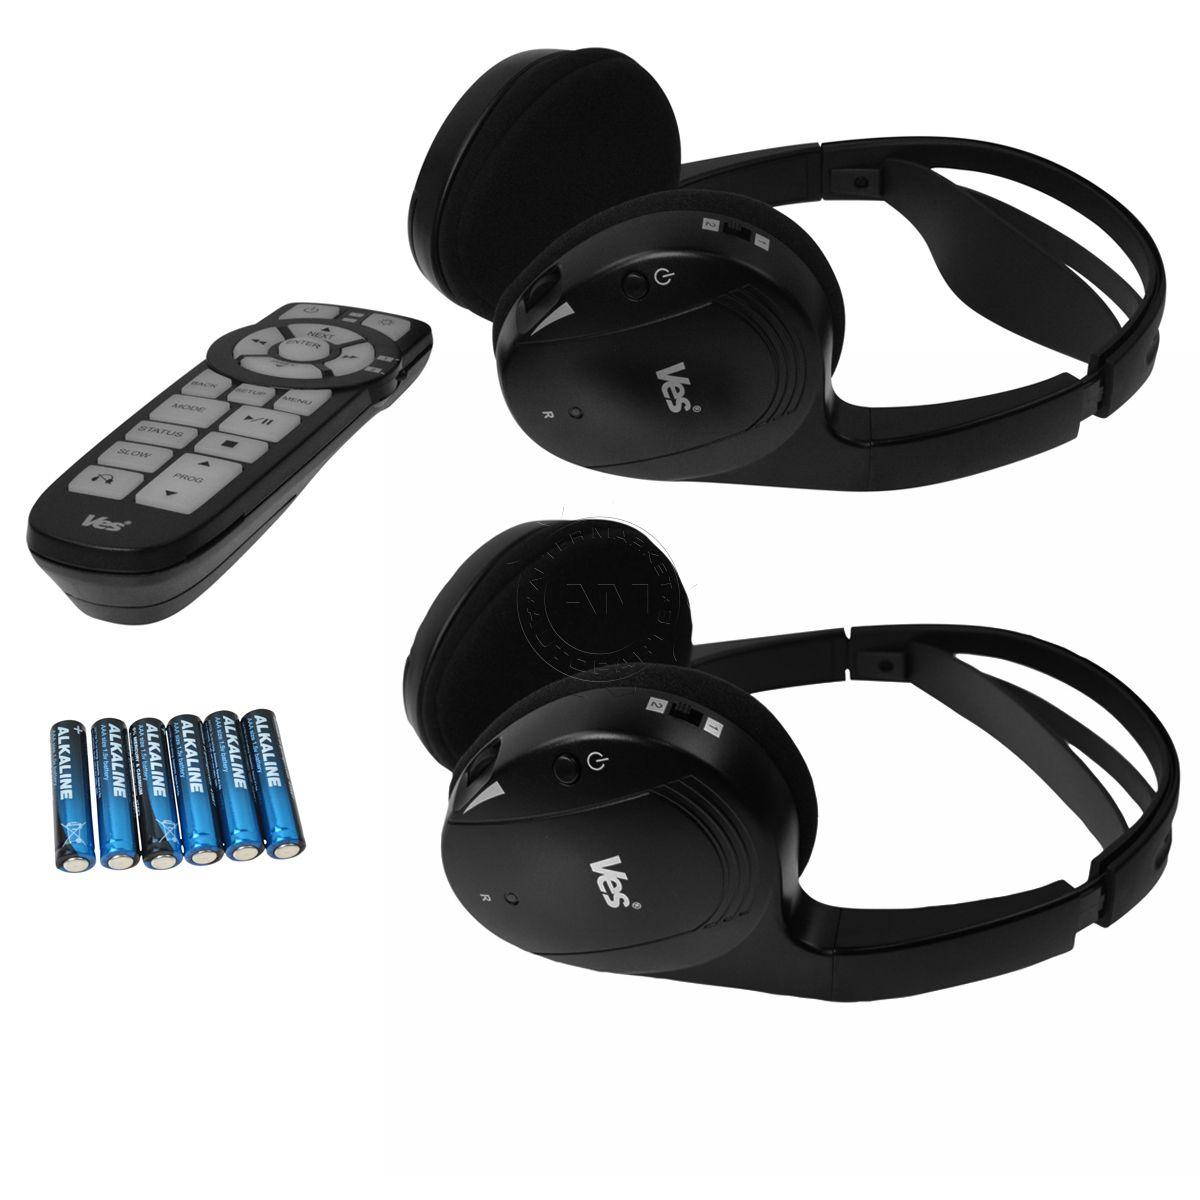 oem 82213176 ves wireless headphones remote control kit for chrysler rh ebay com Chrysler Parts Manuals 2010 Chrysler Manual